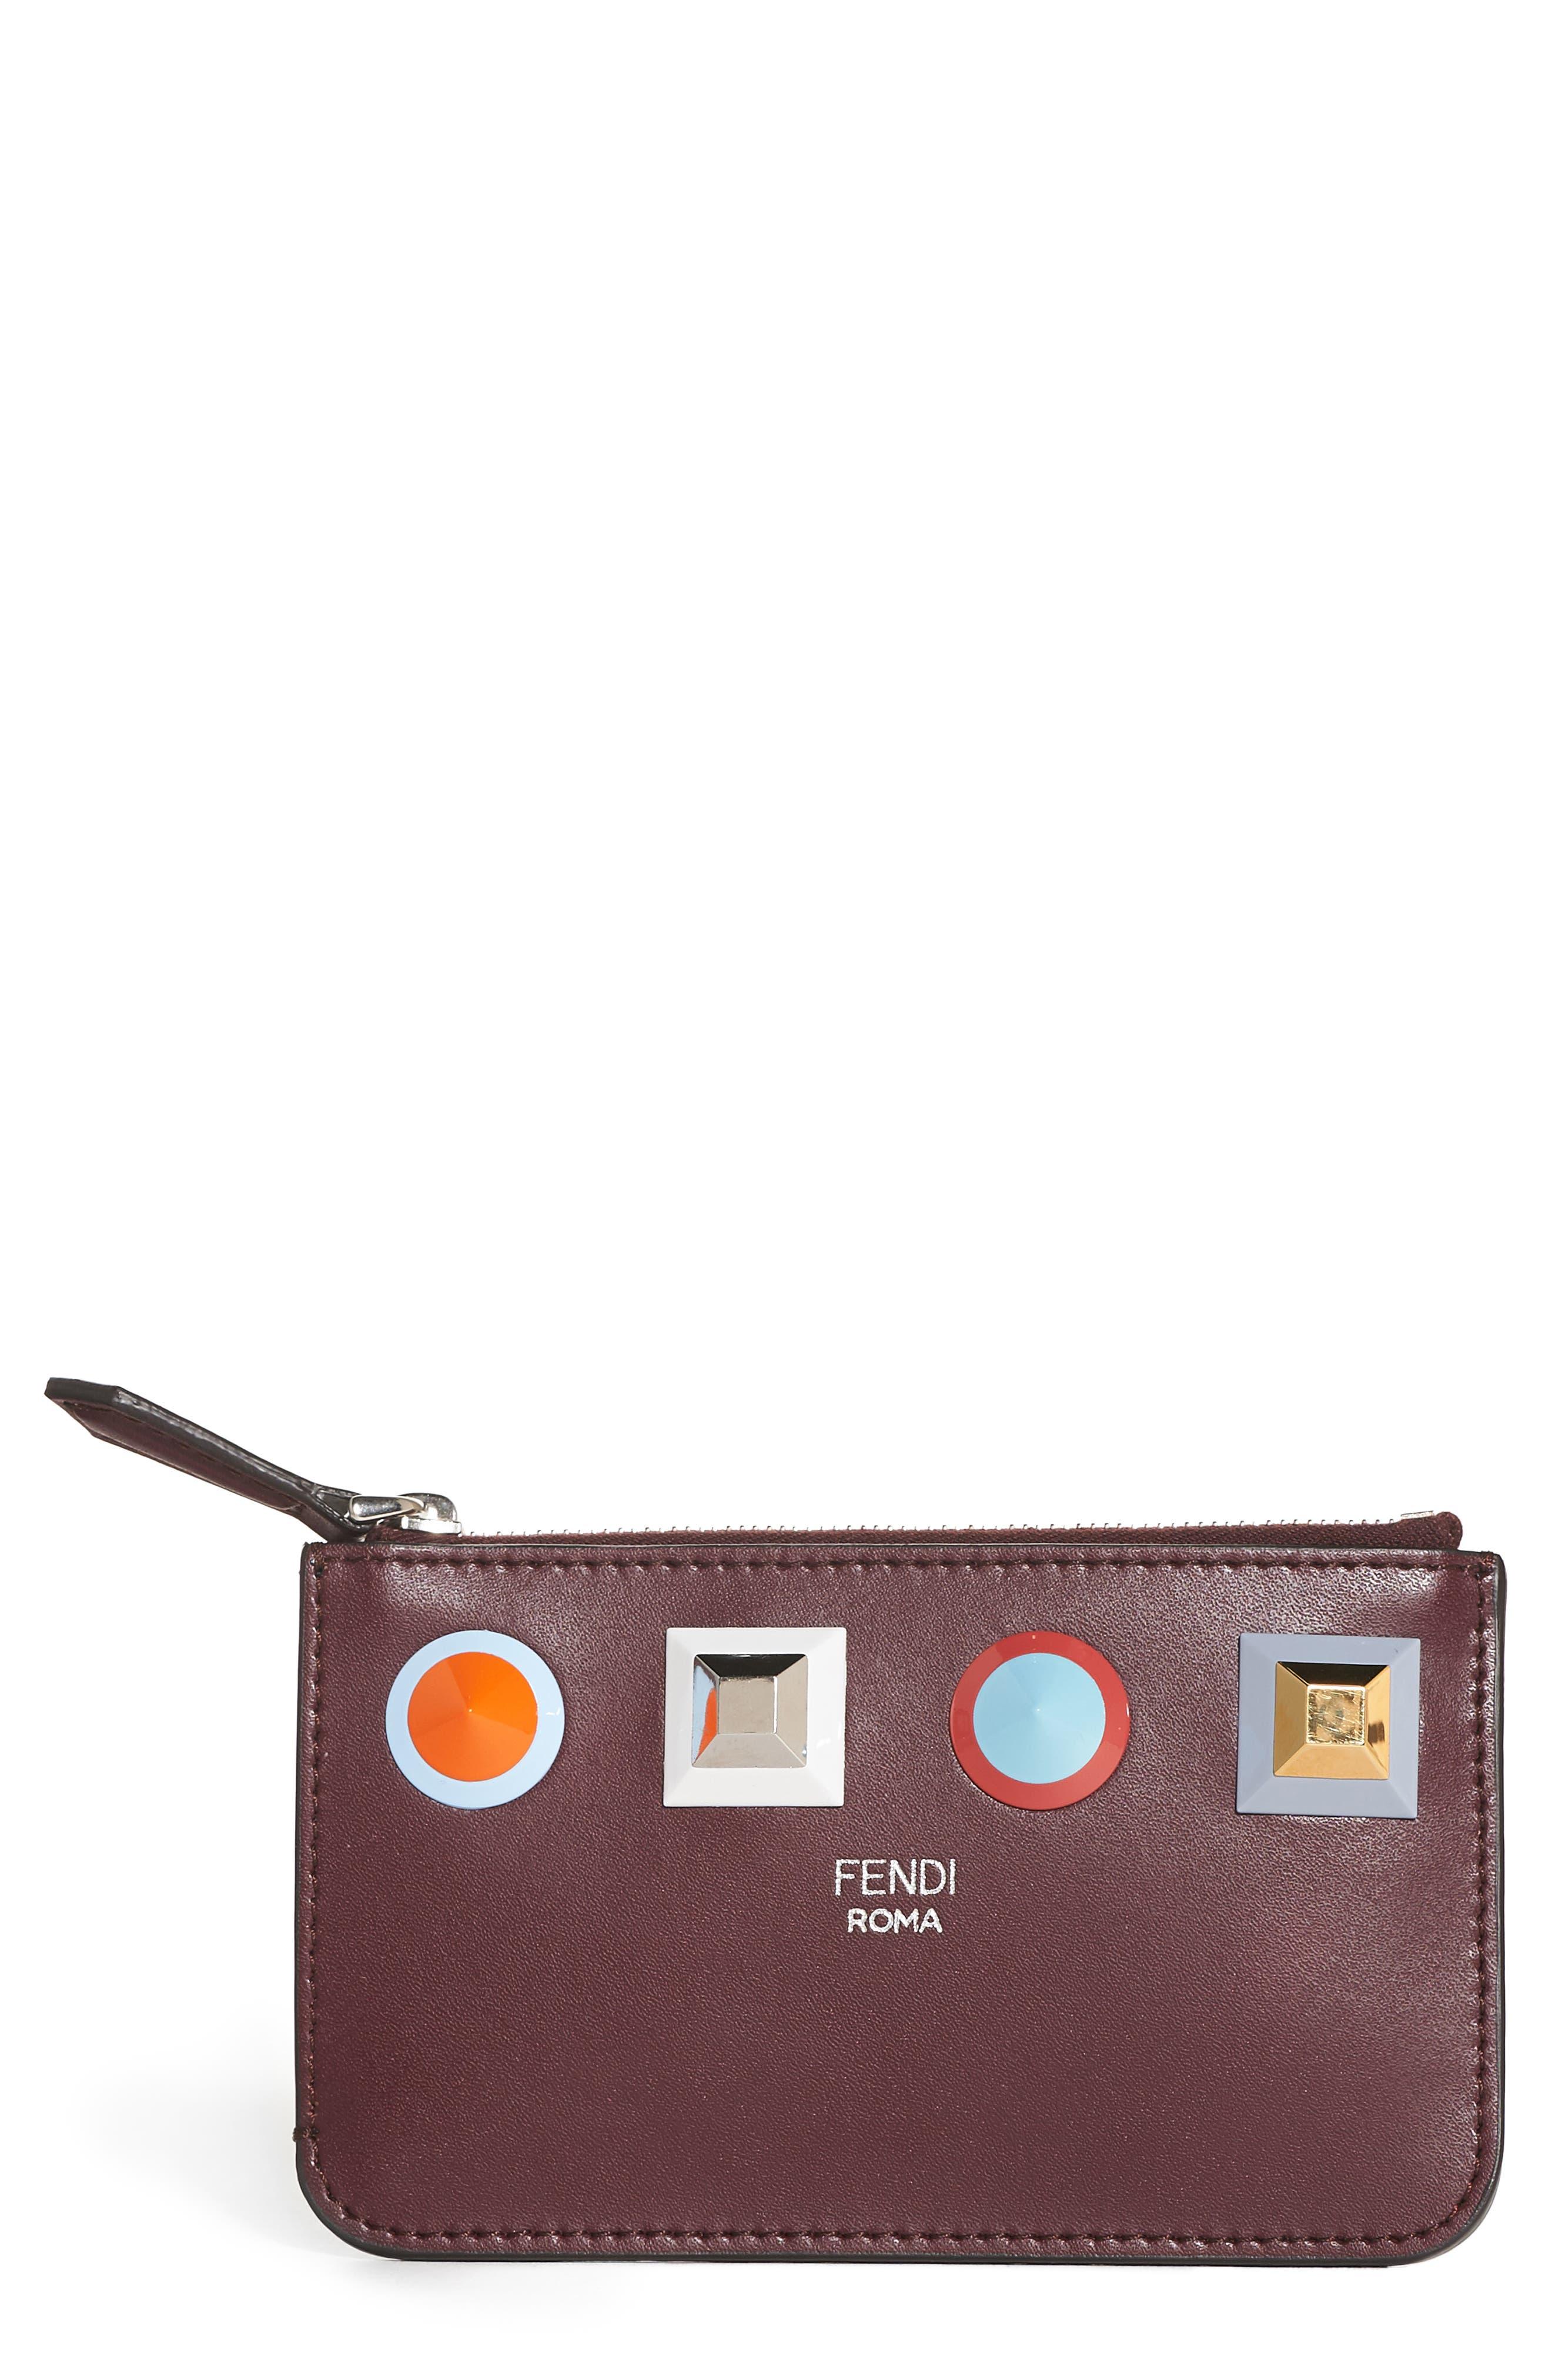 Fendi Large Studded Leather Key Pouch